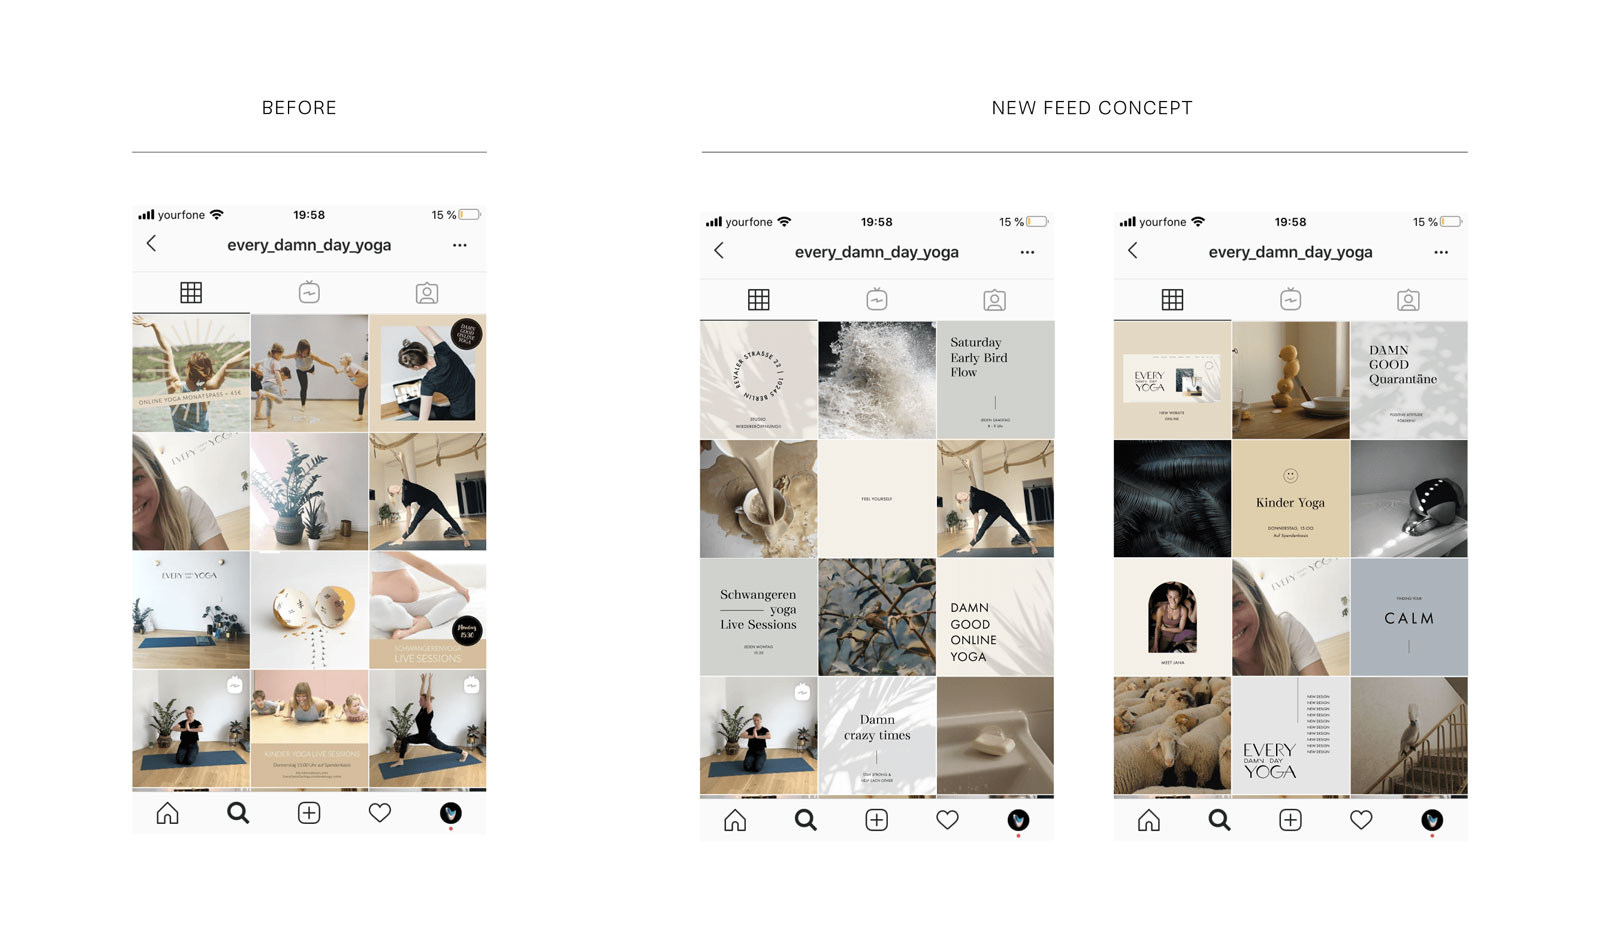 Instagram feed concept design for a yoga studio in Berlin